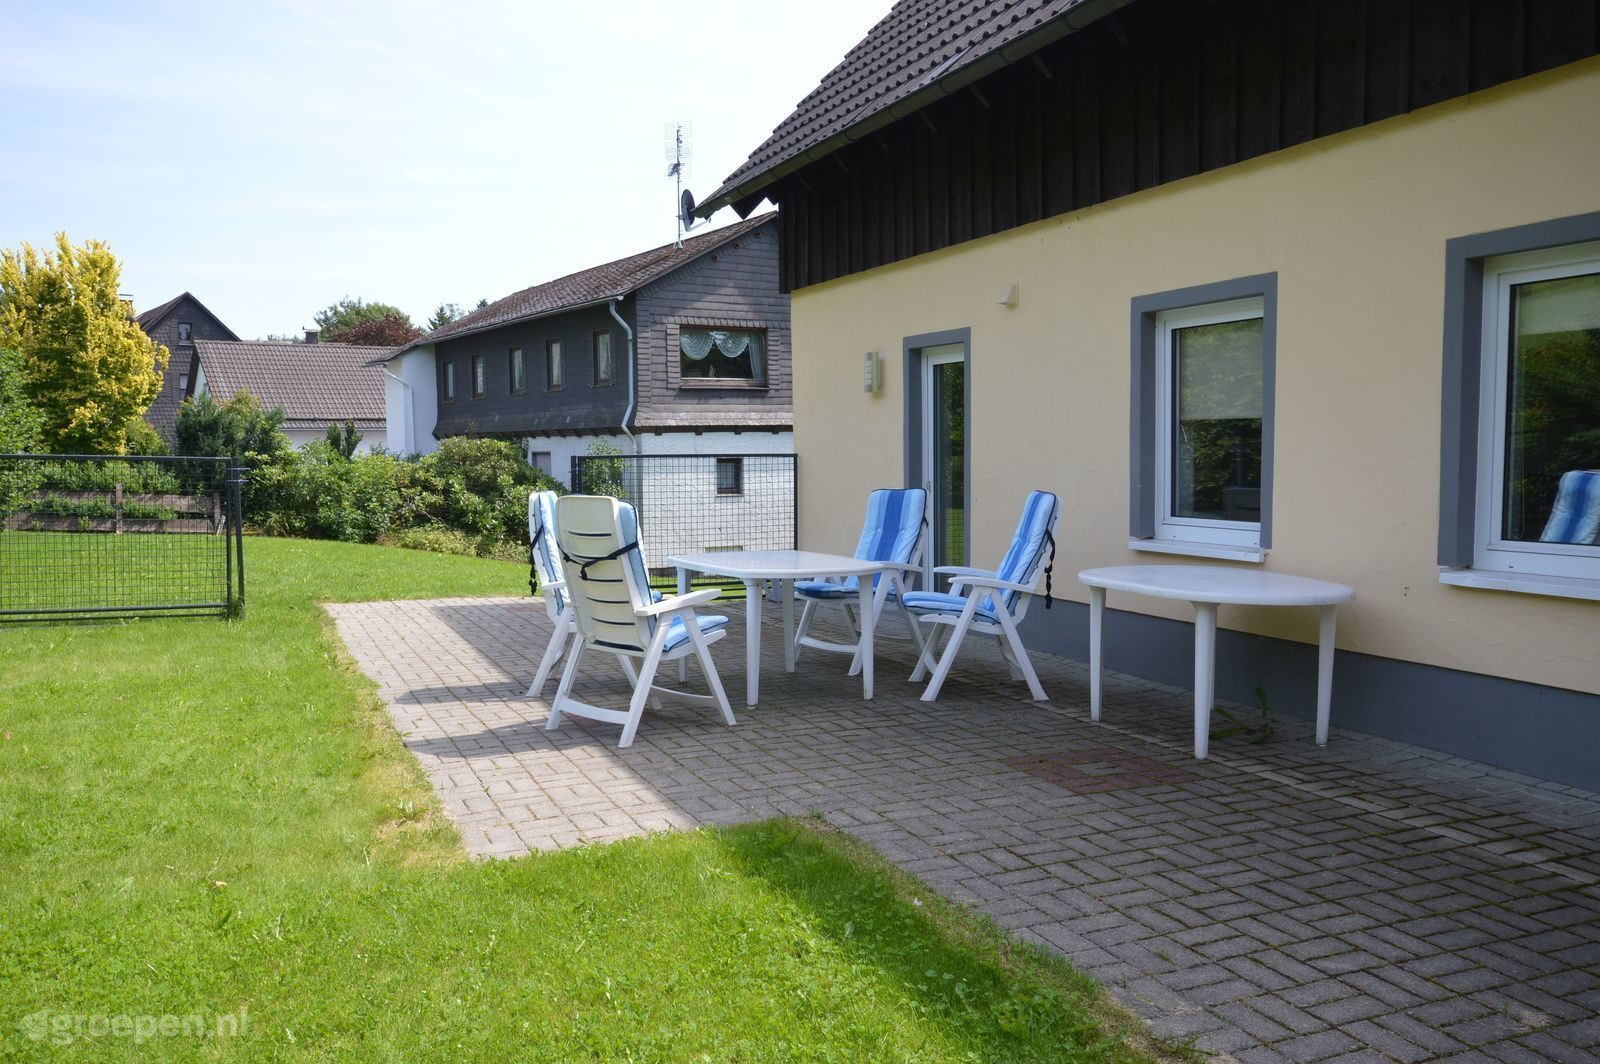 Gruppenunterkunft Winterberg-Mollseifen